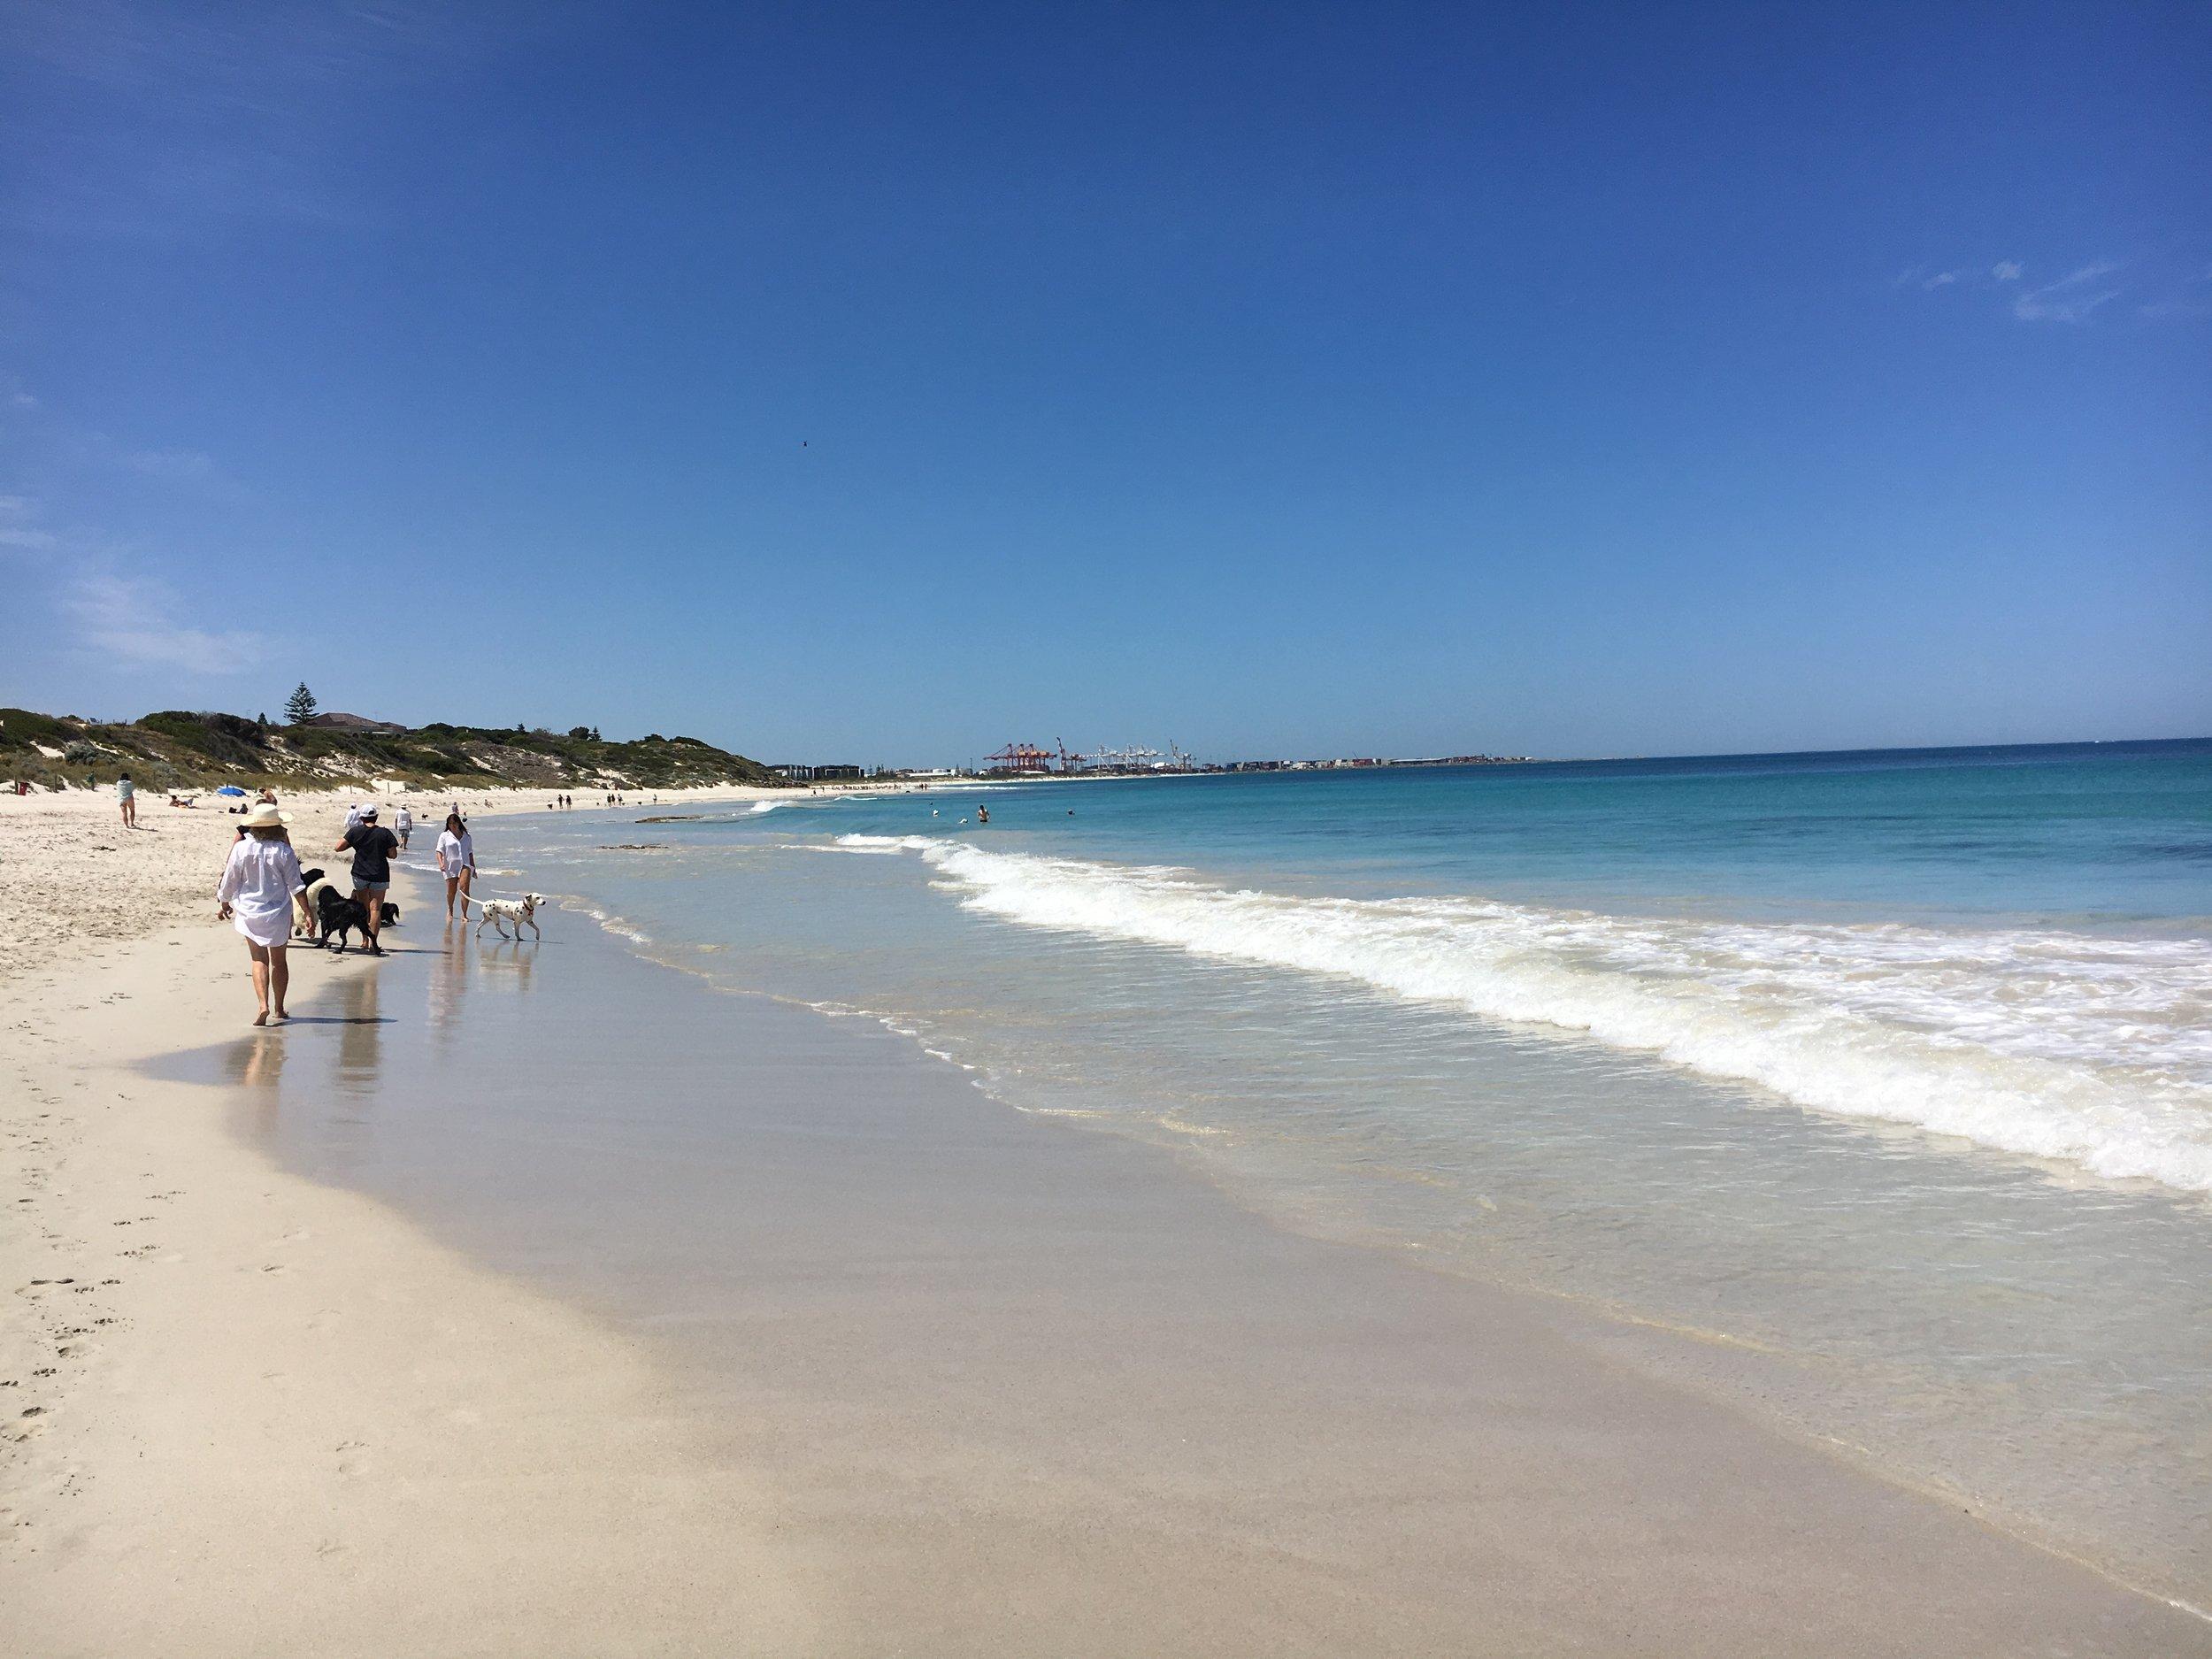 Leighton Dog Beach